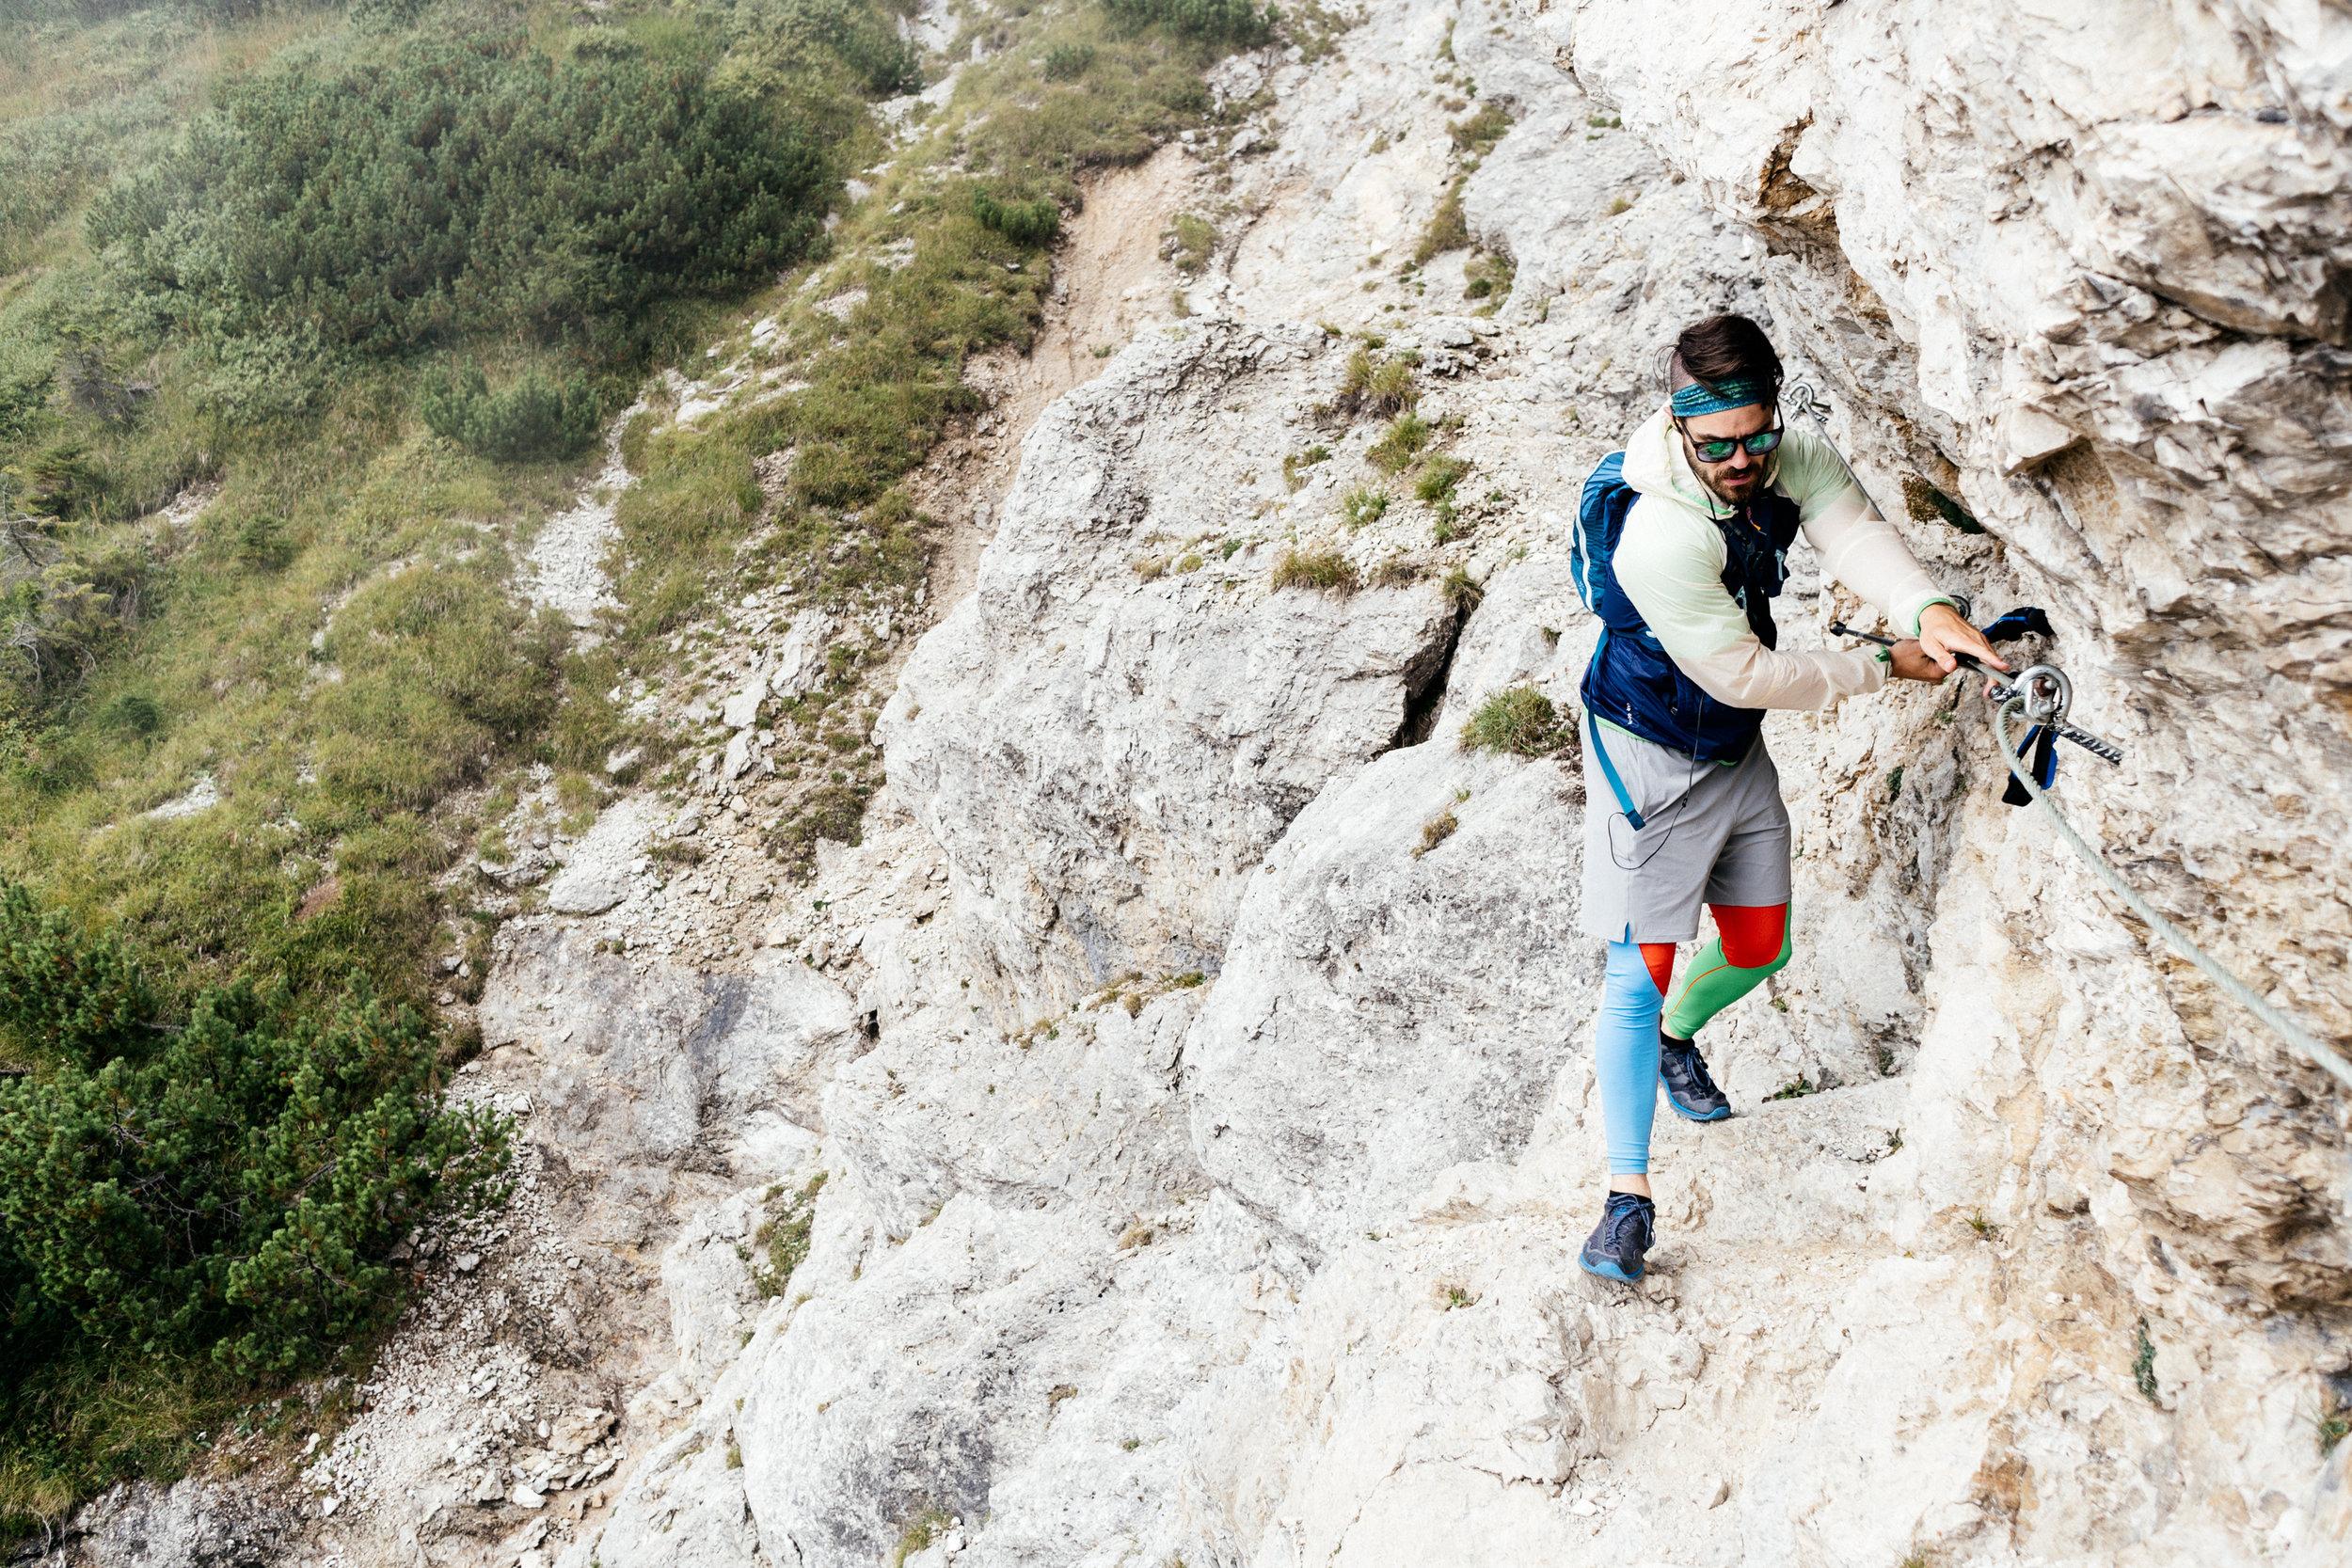 Dolomites-ChrisBrinleeJr-SEP17-20.jpg